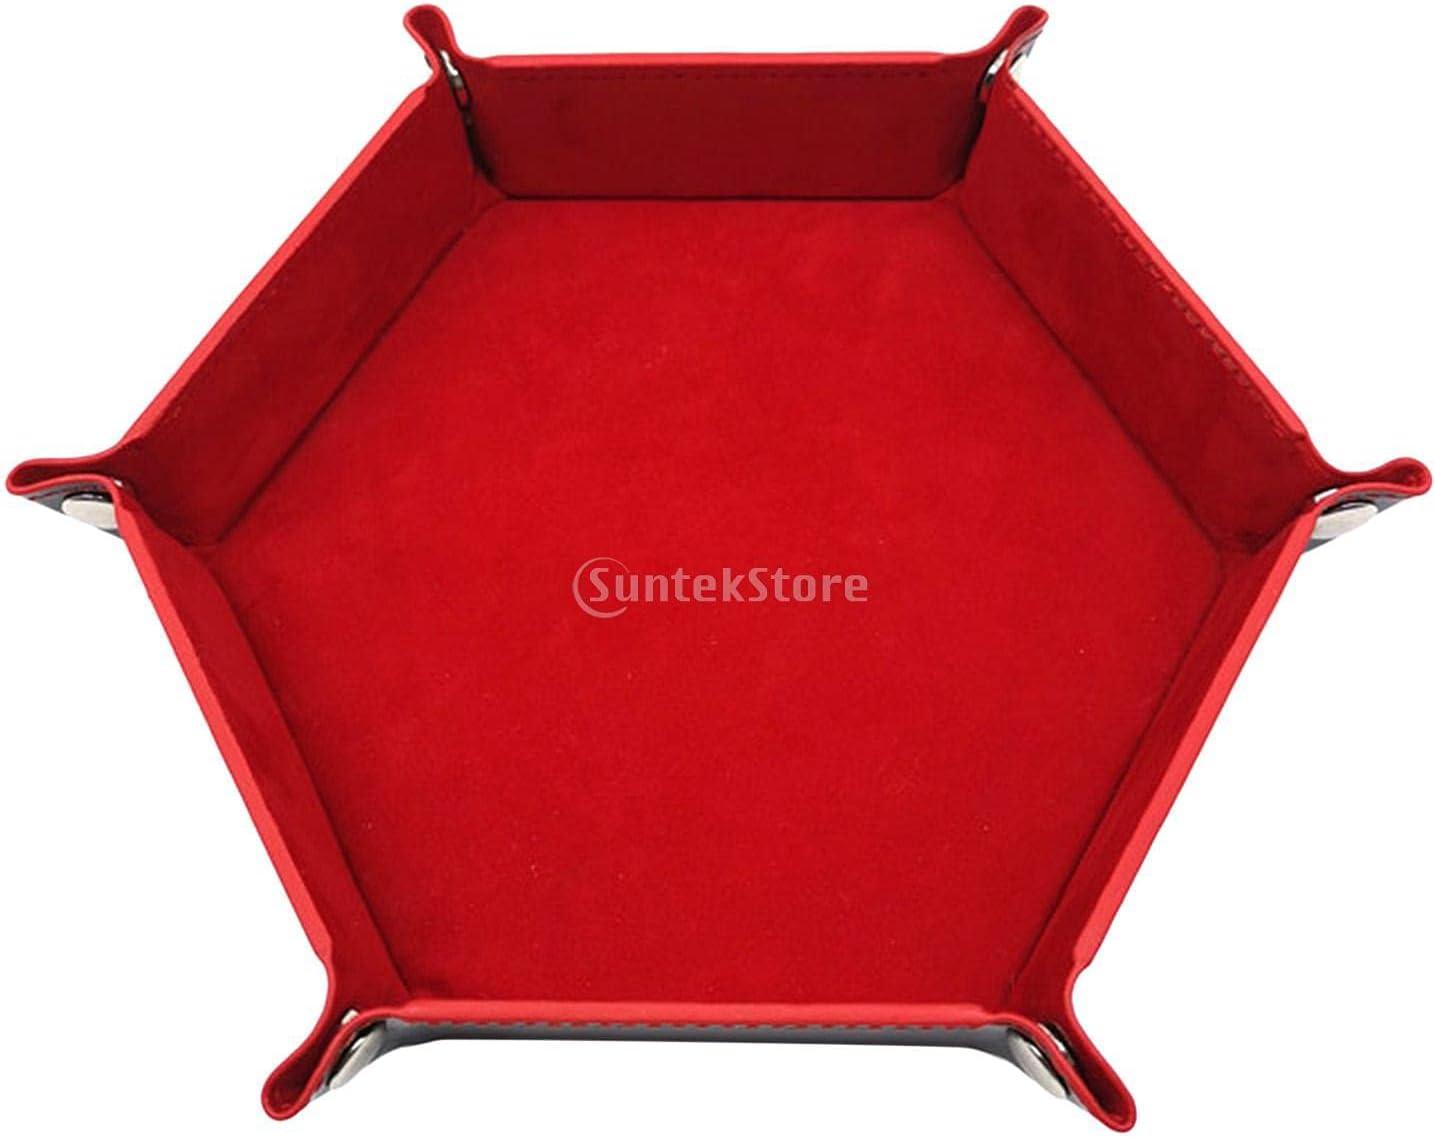 LKJHGH Foldable Hexagon Dice Tray Box T Key Coin Max 71% OFF Storage mart Leather